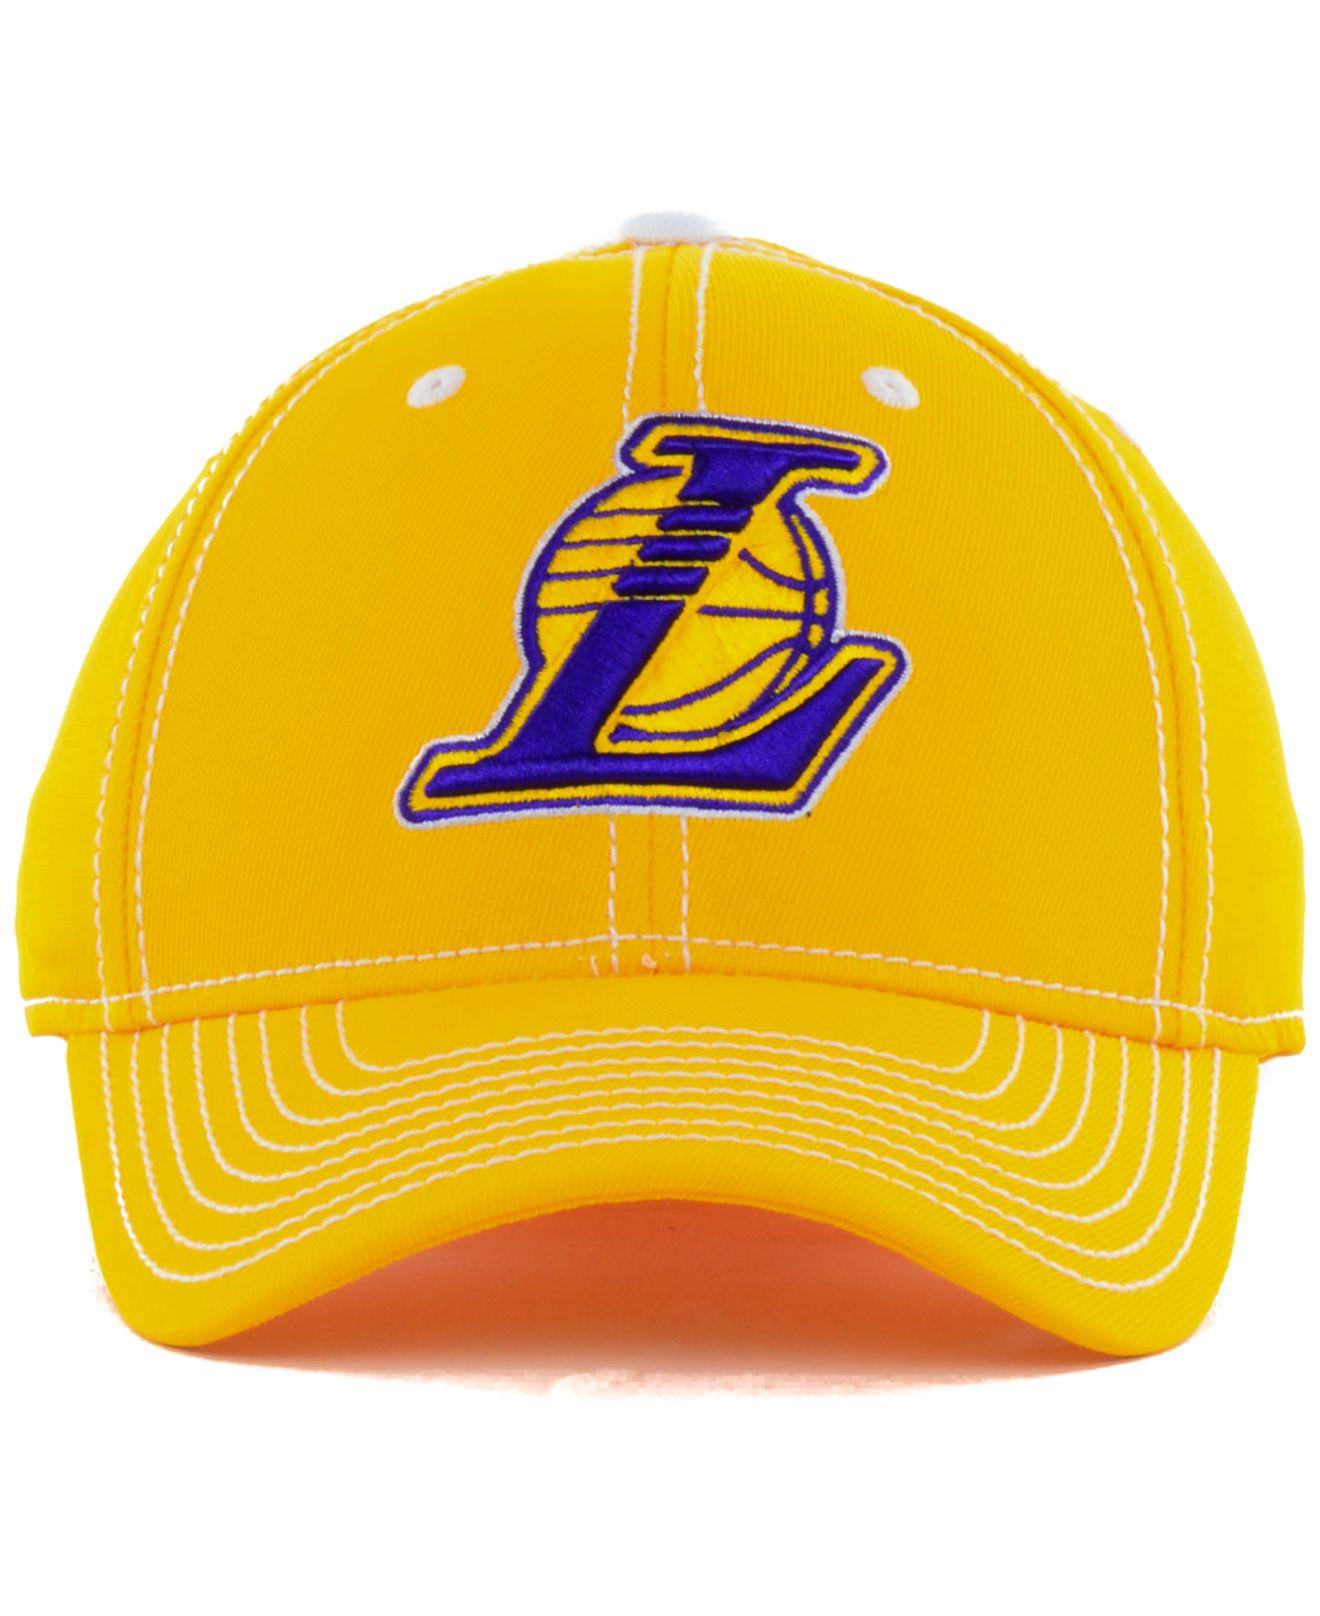 b4569d3b2c8 Lyst - adidas Los Angeles Lakers Nba Primary Team Flex Cap in Yellow ...